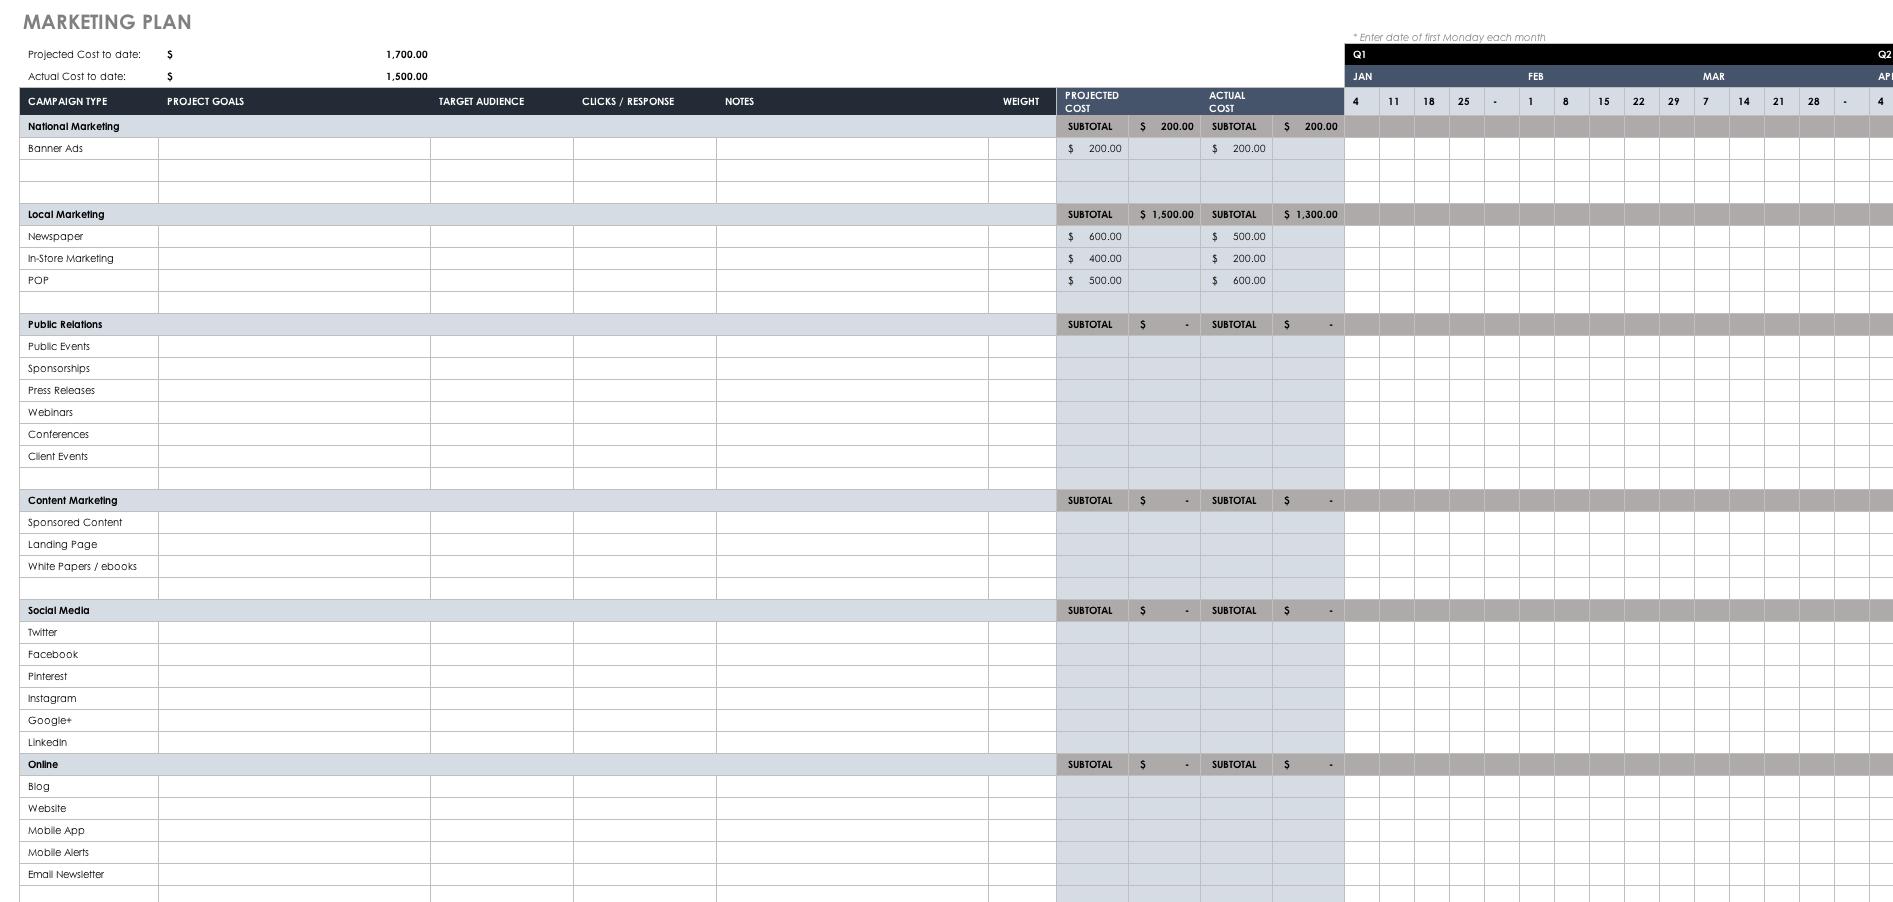 Document Of Digital Marketing Plan Excel Template To Digital Marketing Plan Excel Template For Free